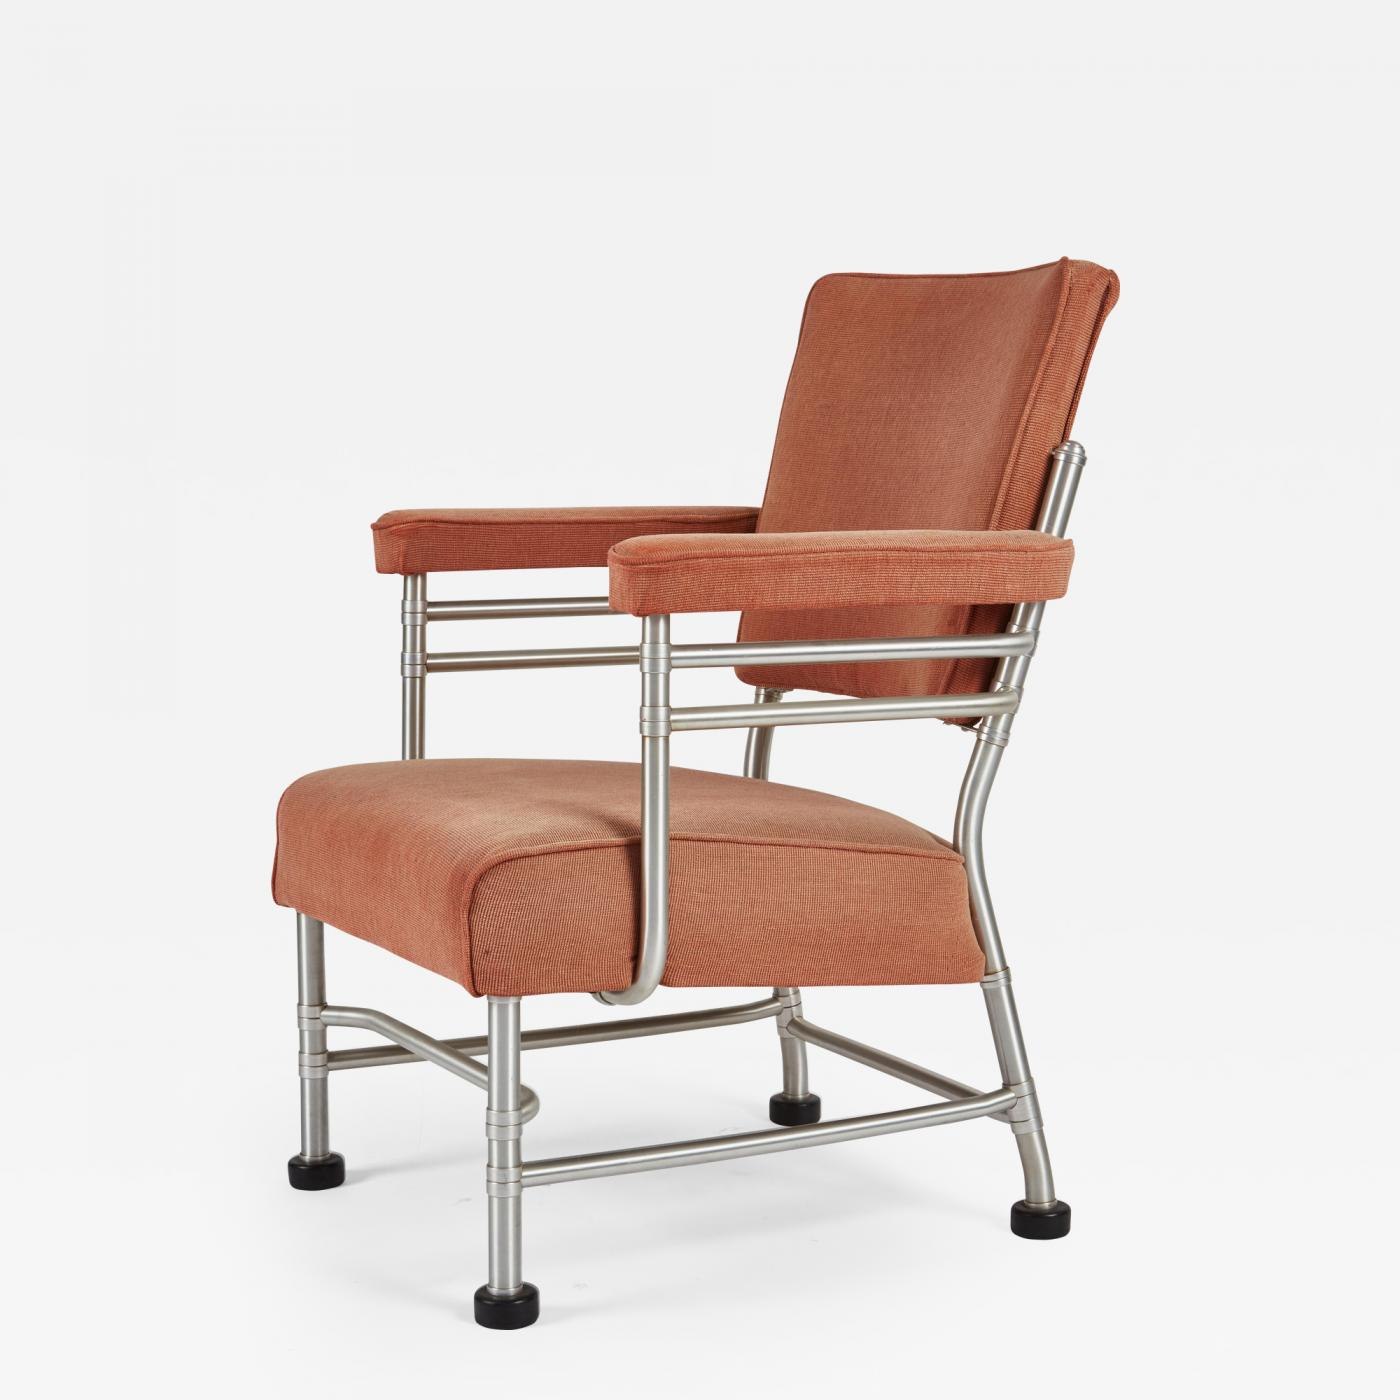 Listings / Furniture / Seating / Armchairs · Warren McArthur Warren  McArthur Aluminum And Rubber Lounge Chair